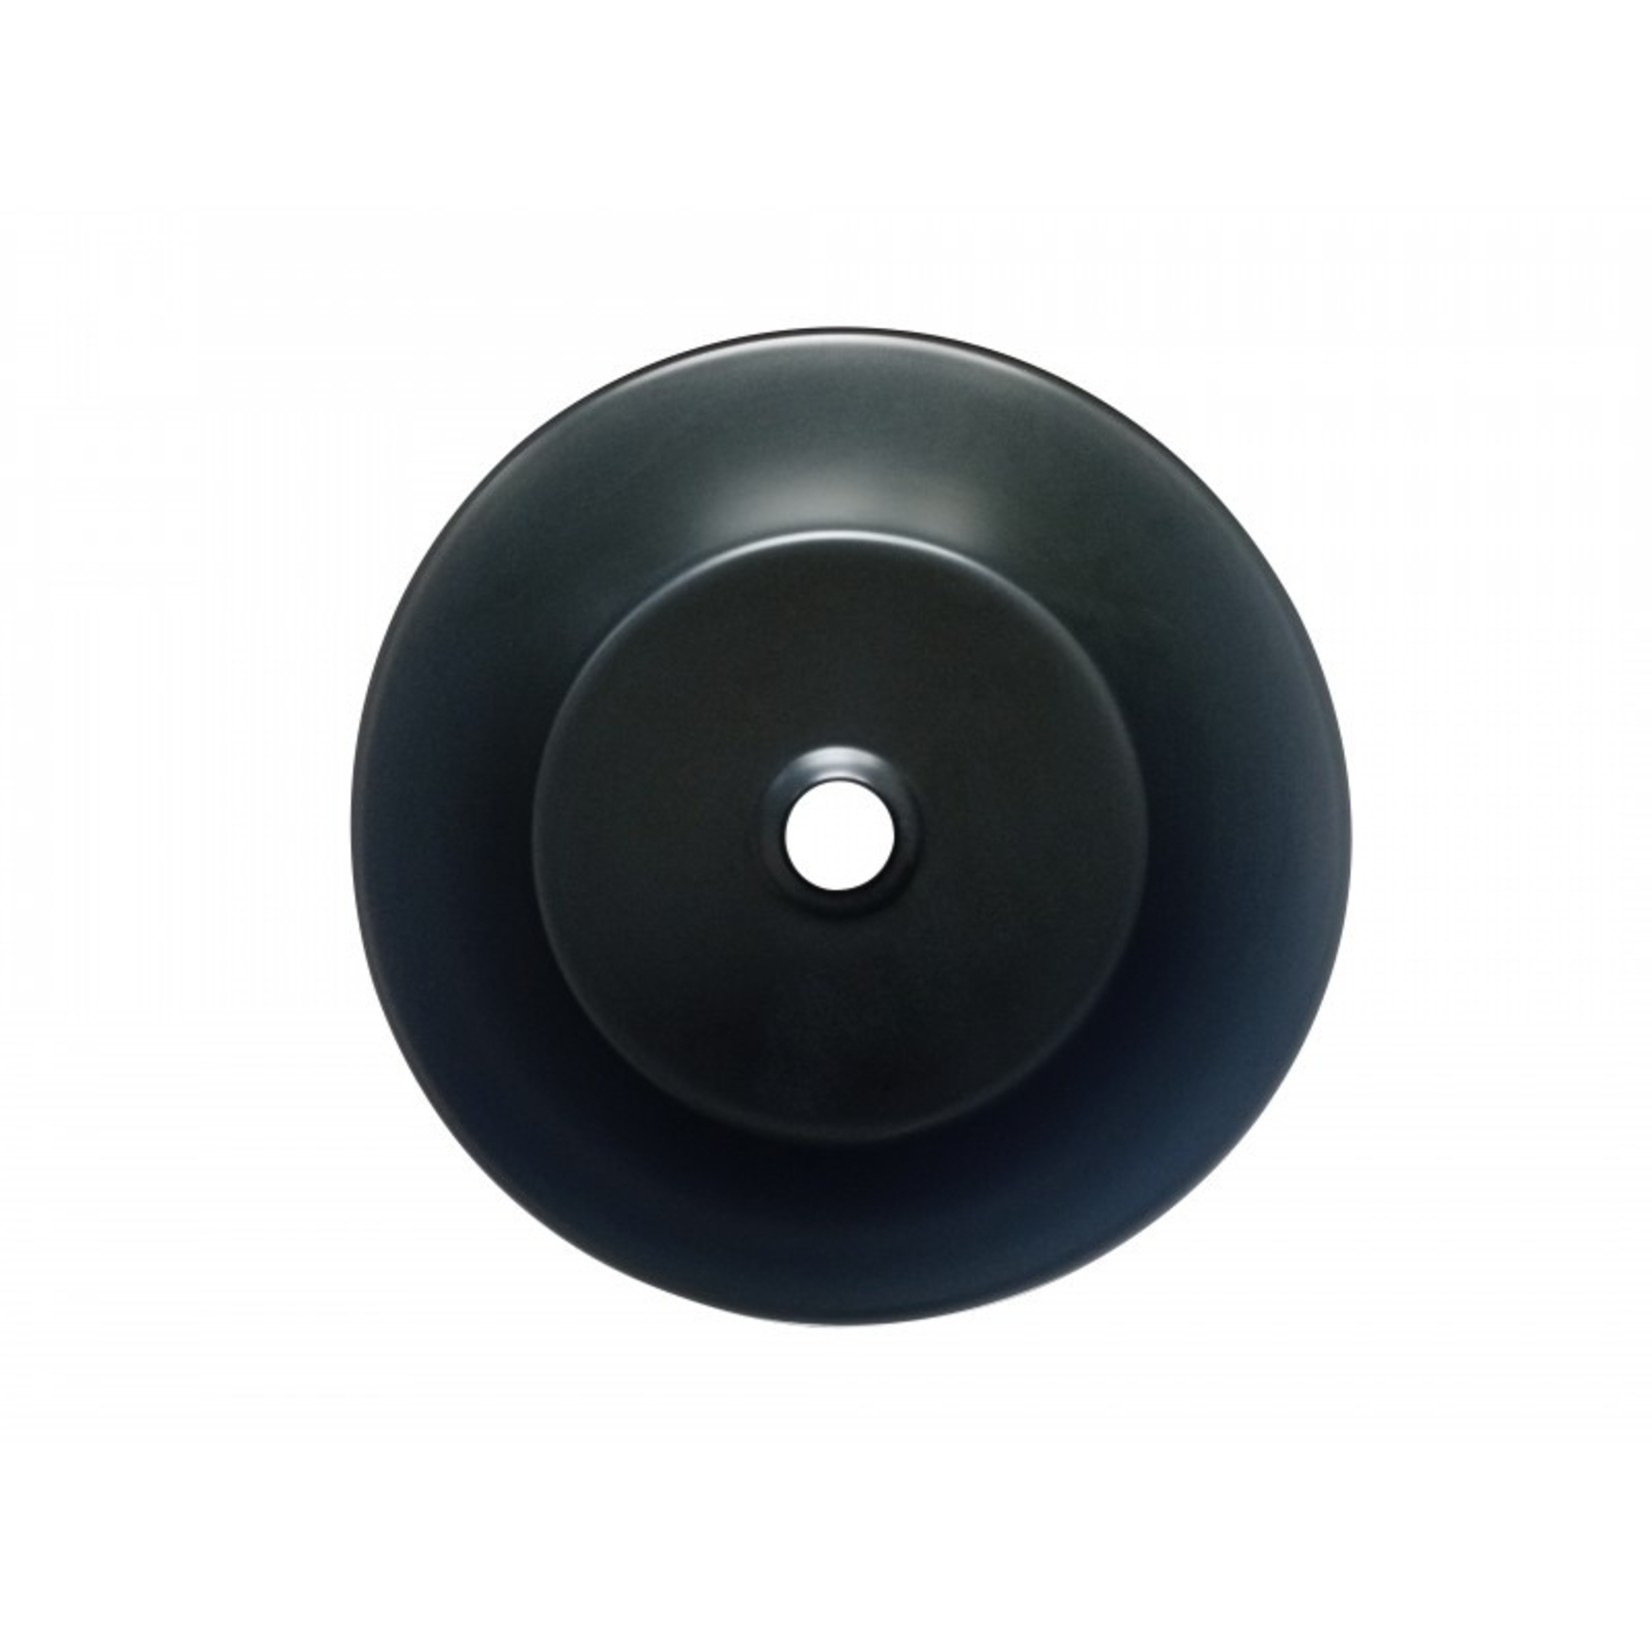 14 '' black porcelain sink DI-206-35B